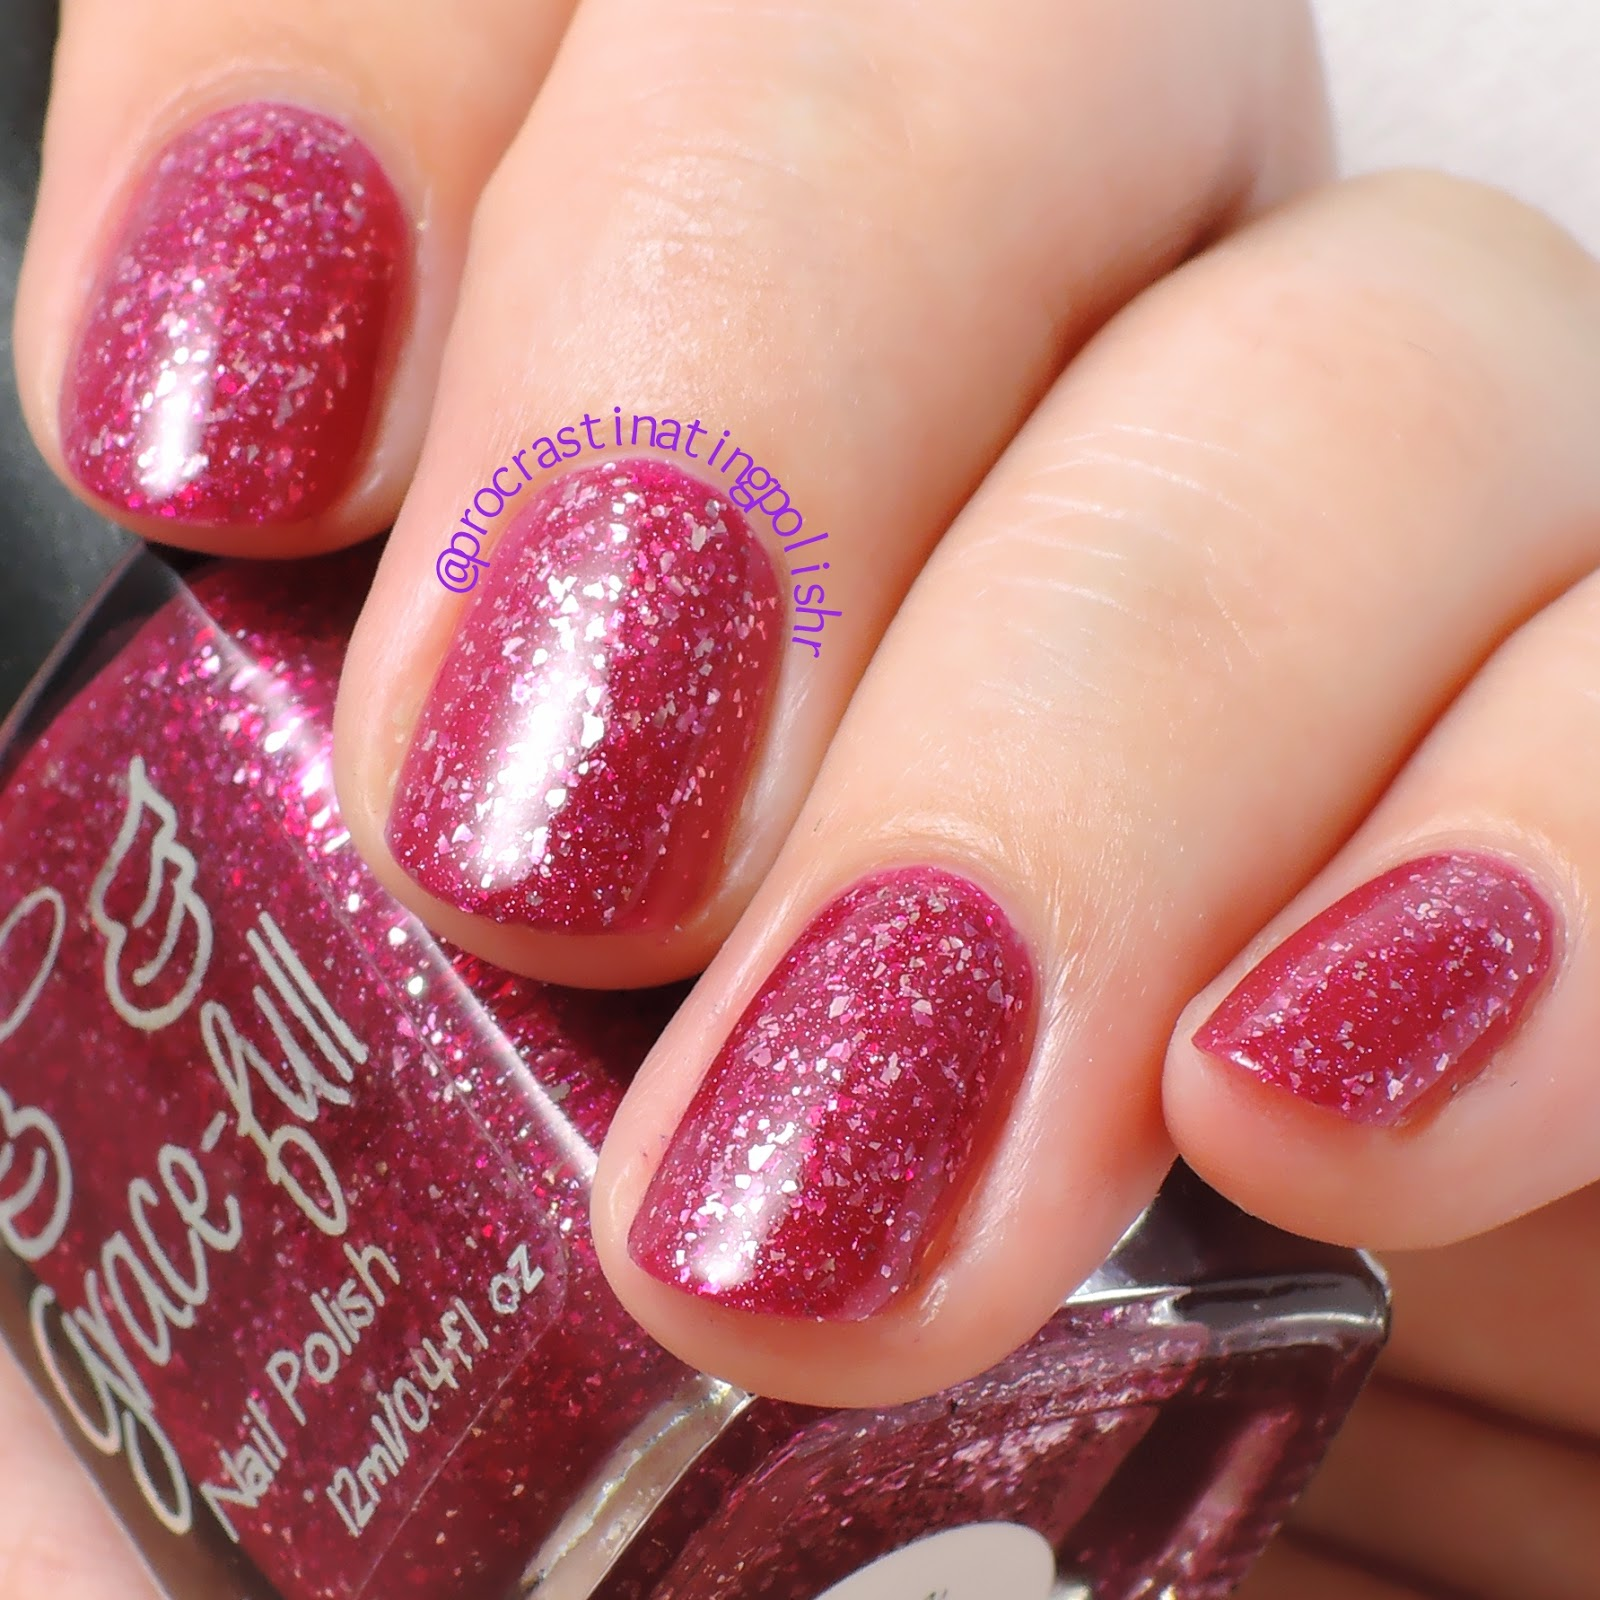 Grace-full Nail Polish - Love Sparkles | Valentine's Day Duo